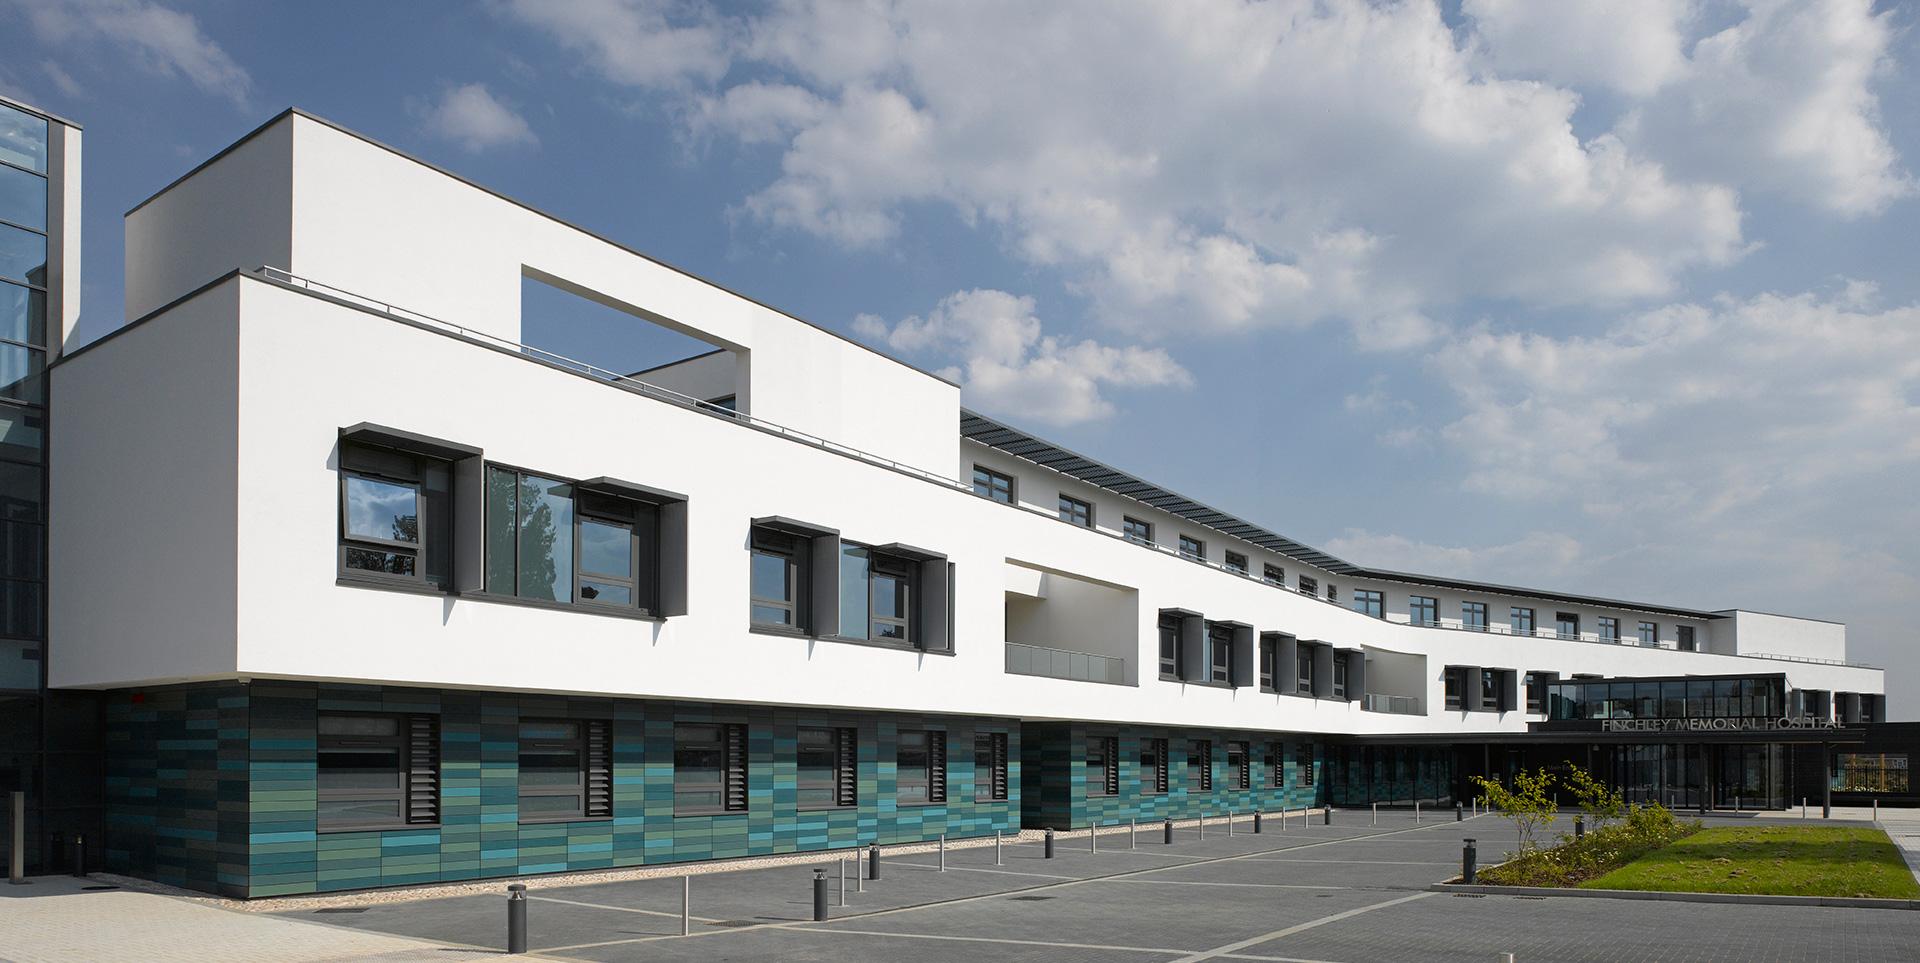 Finchley Memorial Hospital 1